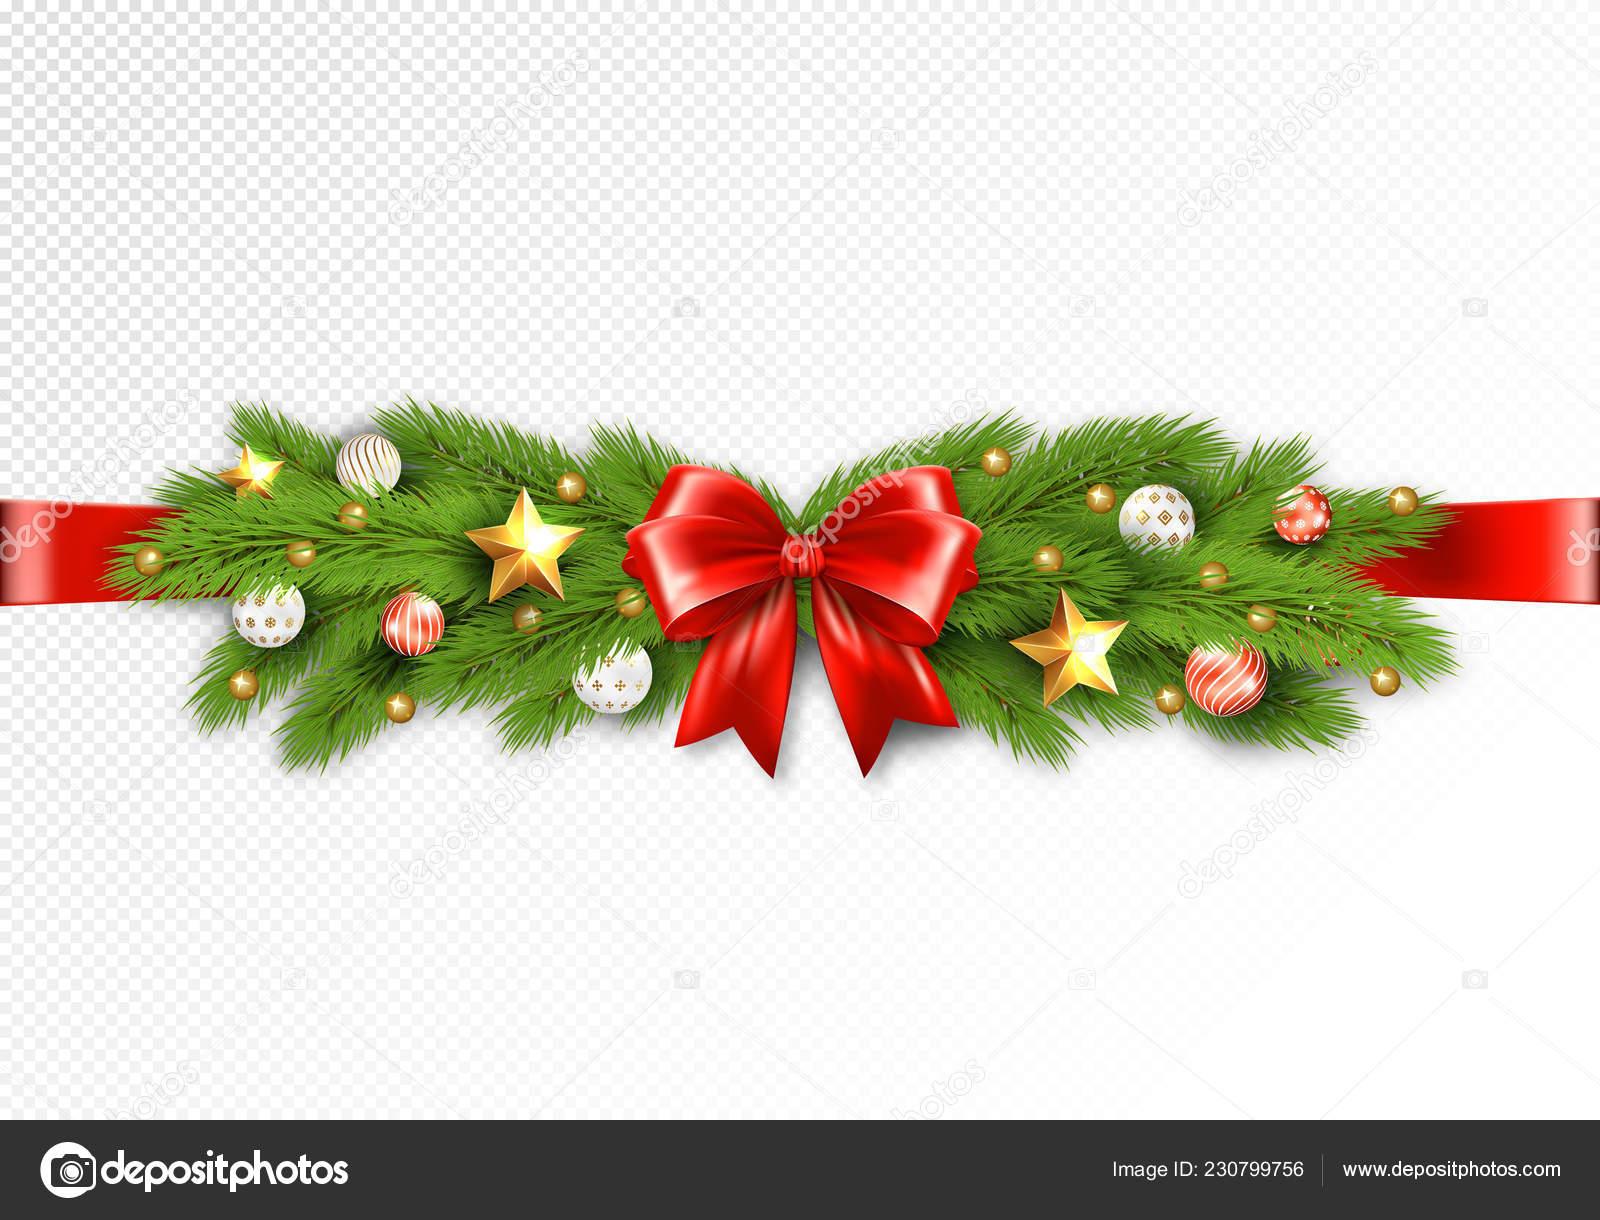 Christmas Transparent Background.Detailed Christmas Garland Transparent Background Stock